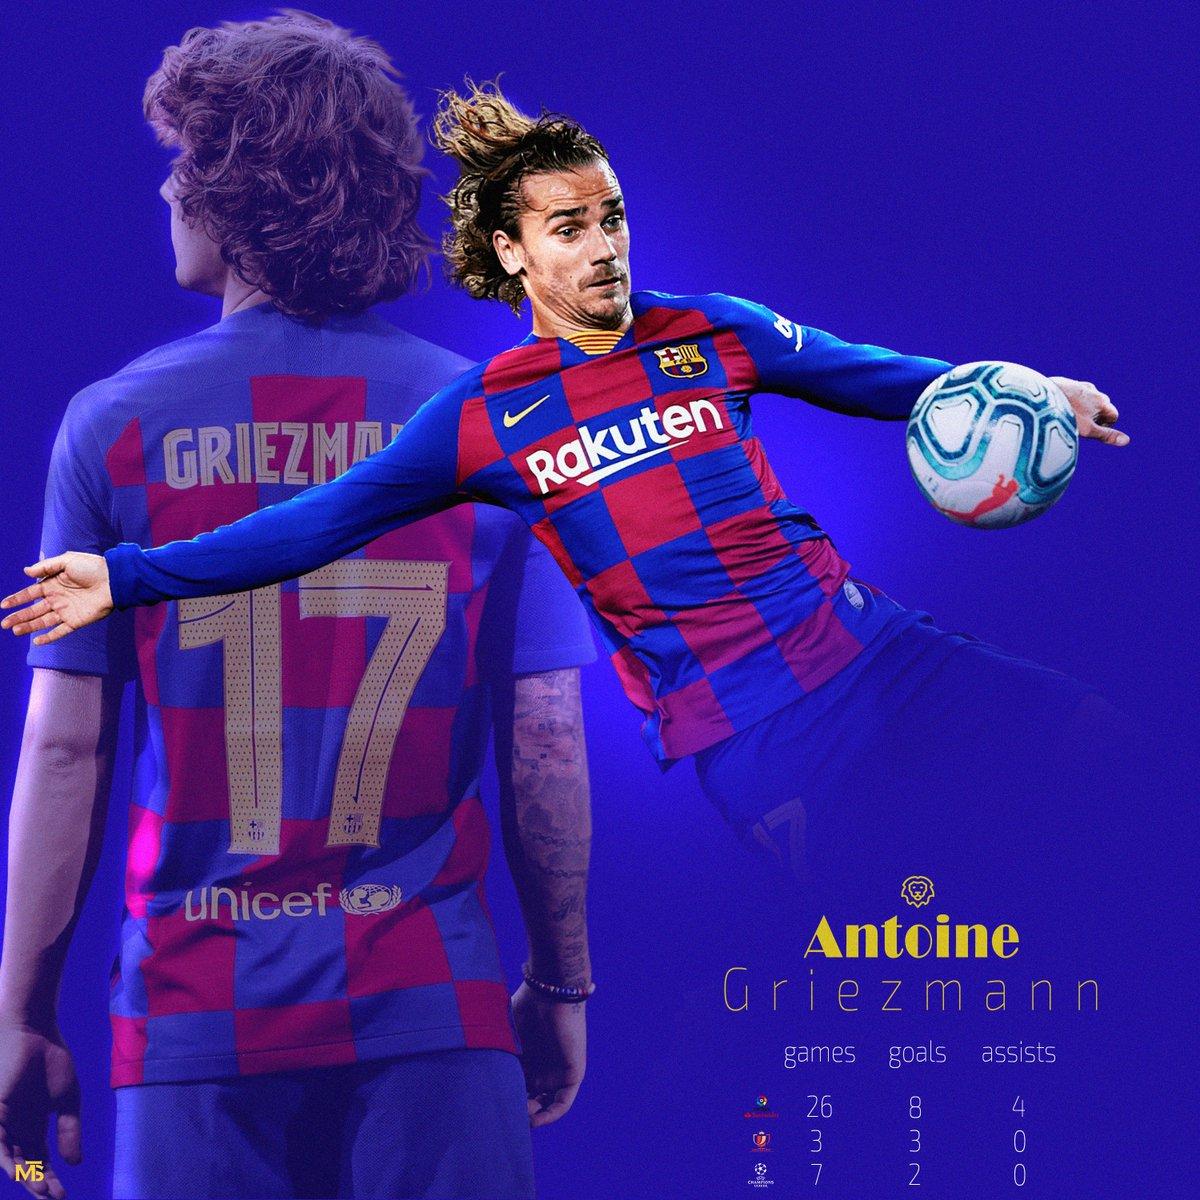 #Griezmann stats this Season so far  #barcelona #FCBarcelonapic.twitter.com/GQrSfqHVGn